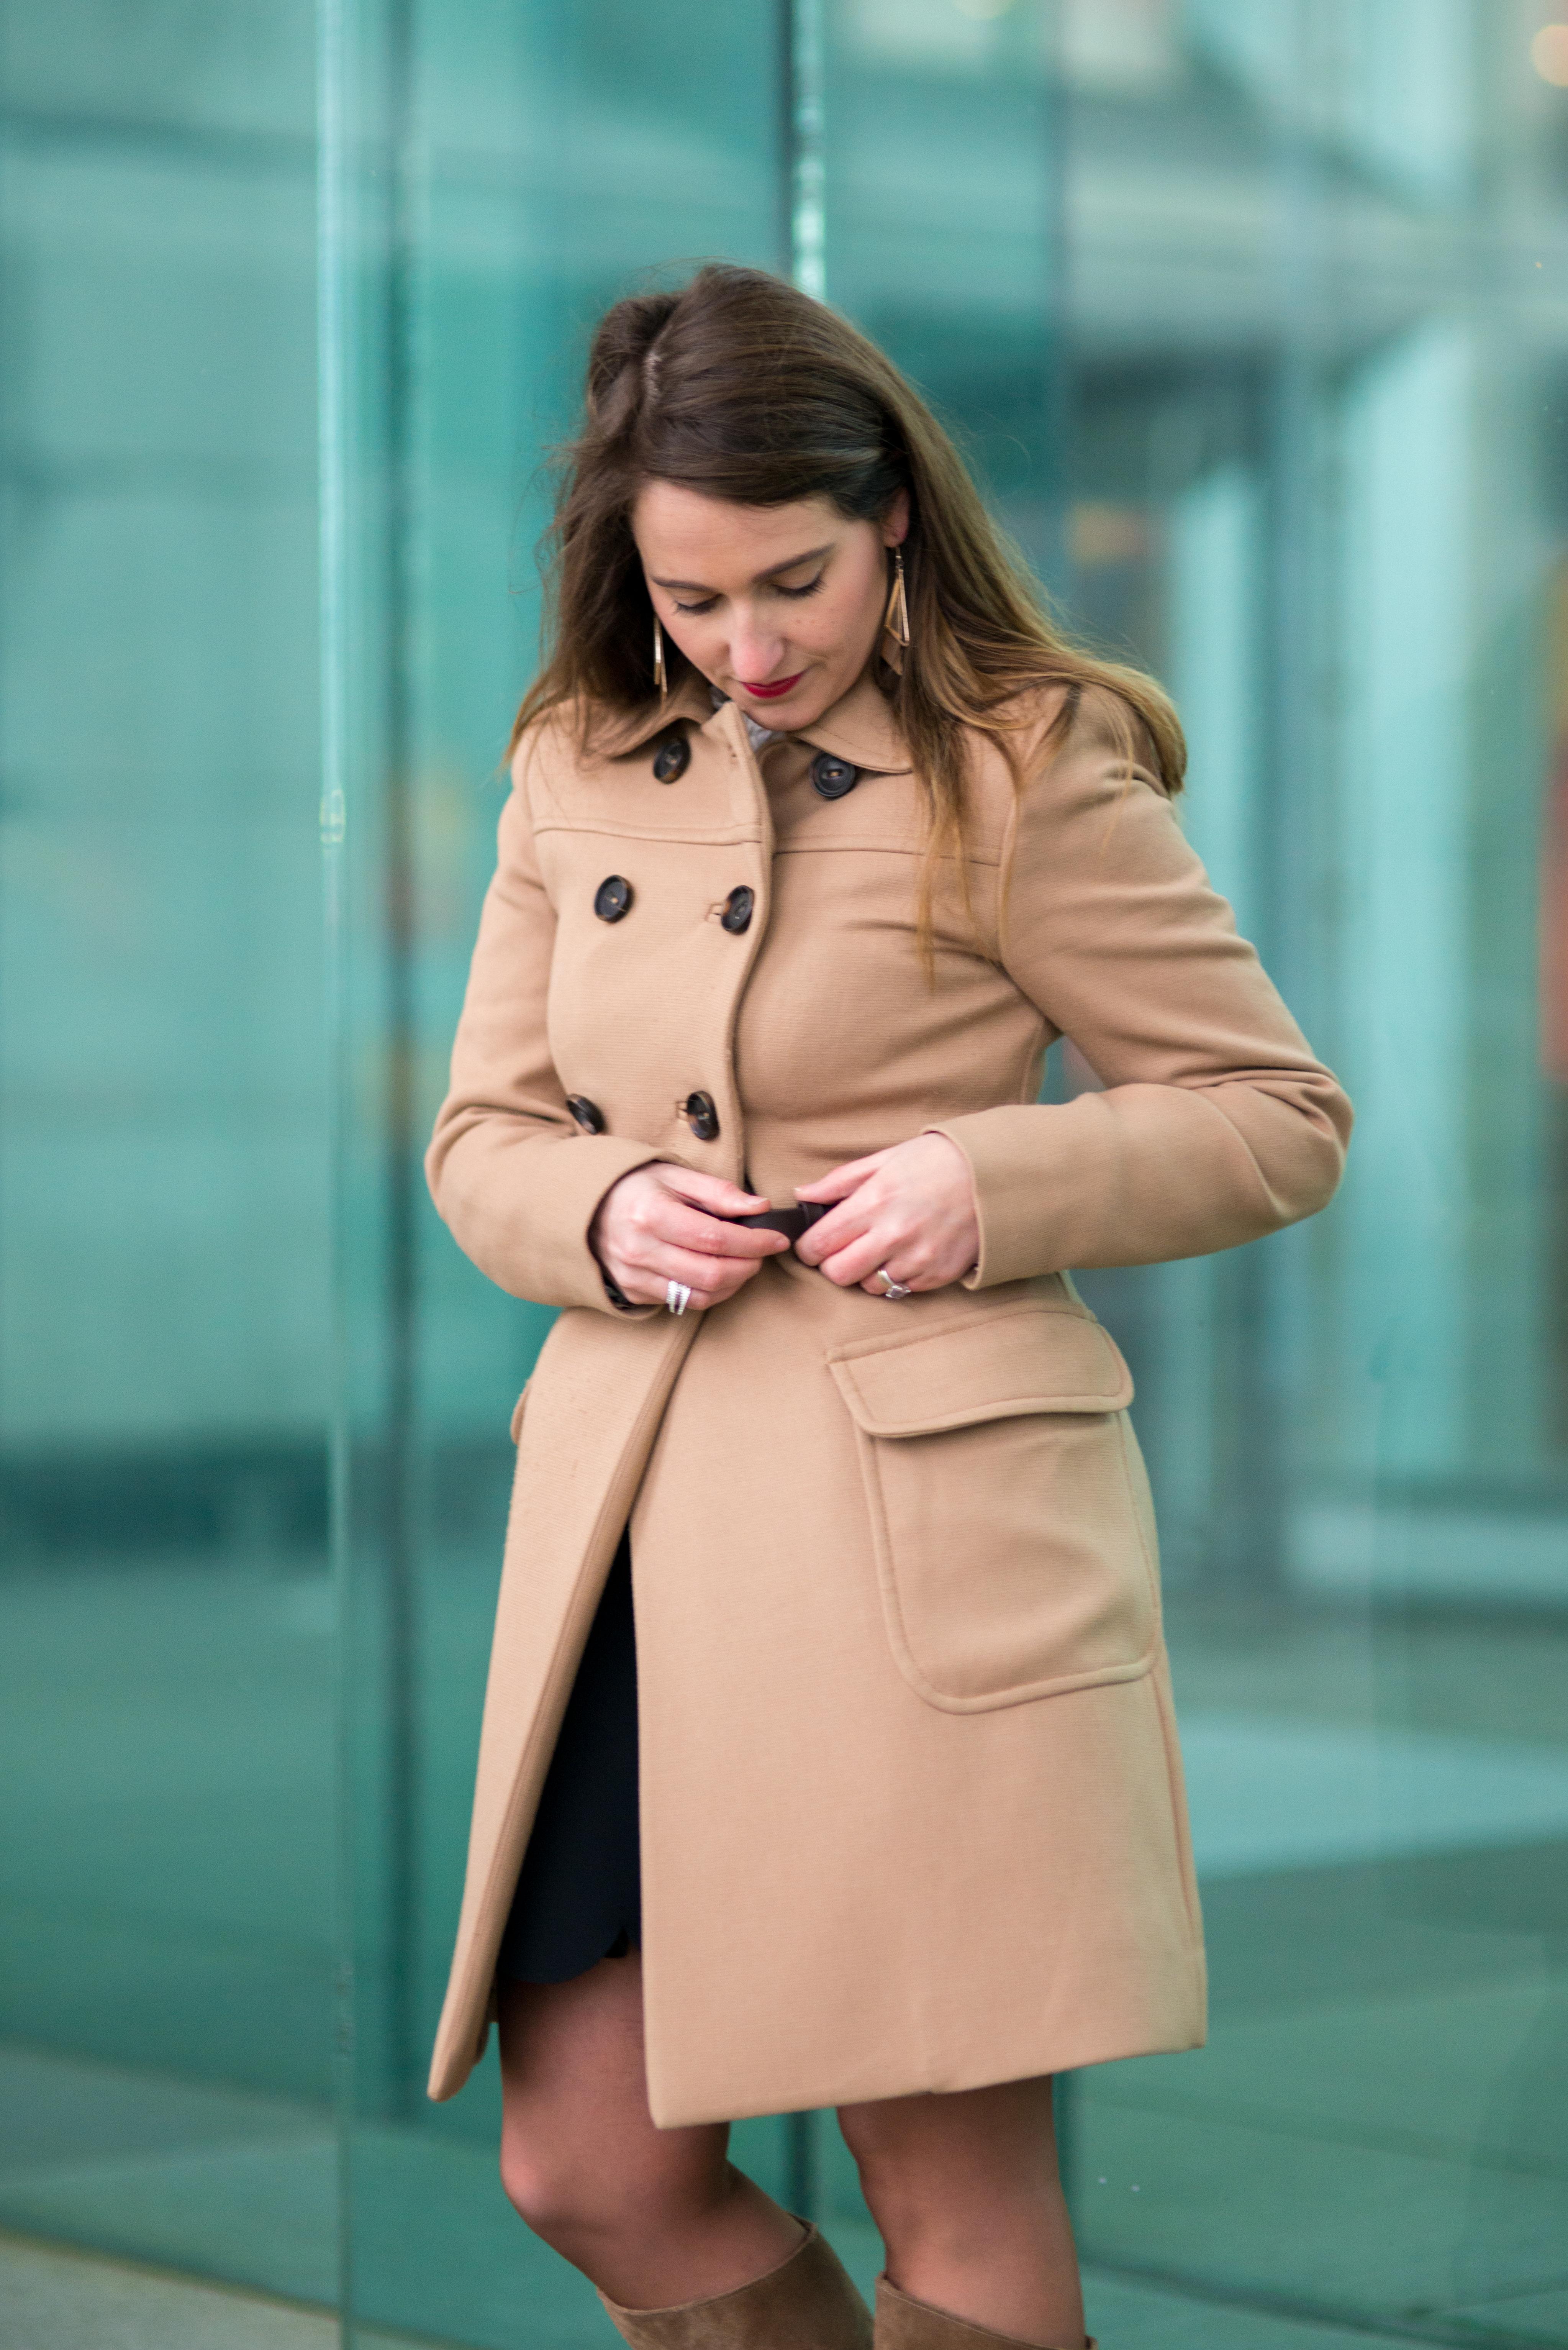 style-sophistique-modele-grandearche-ladefense-paris-fashionblogger-influencer-blouse-zara-seralynepointcom-ump_6699